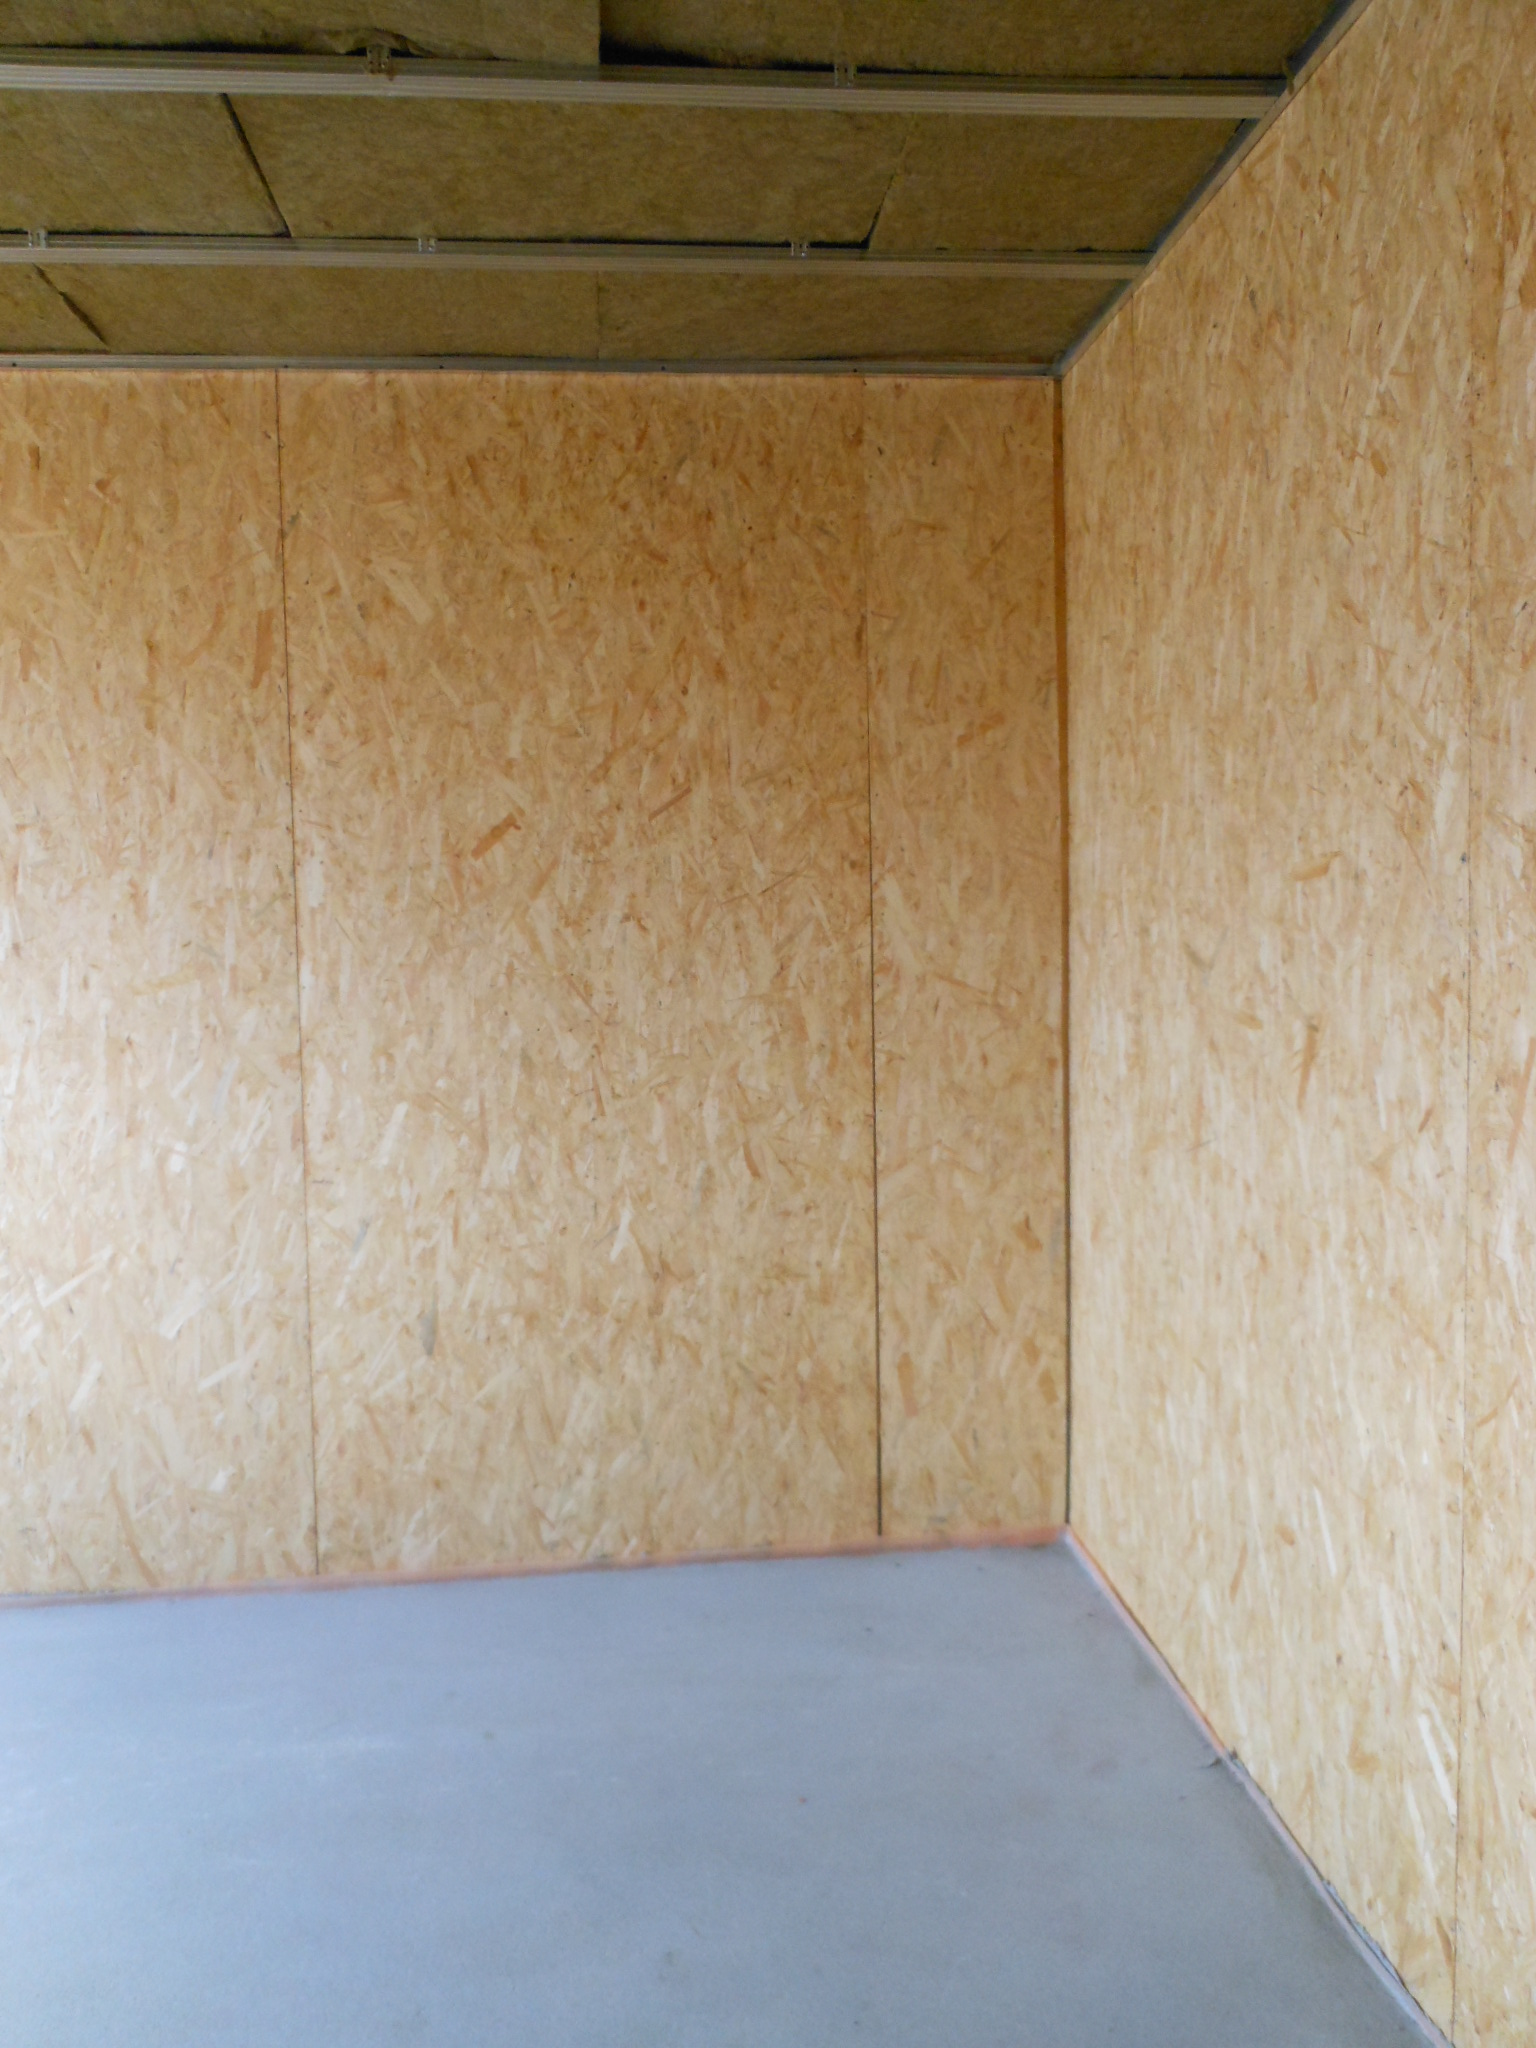 Structuri - case in constructie, constructii din lemn Compart srl - Poza 9